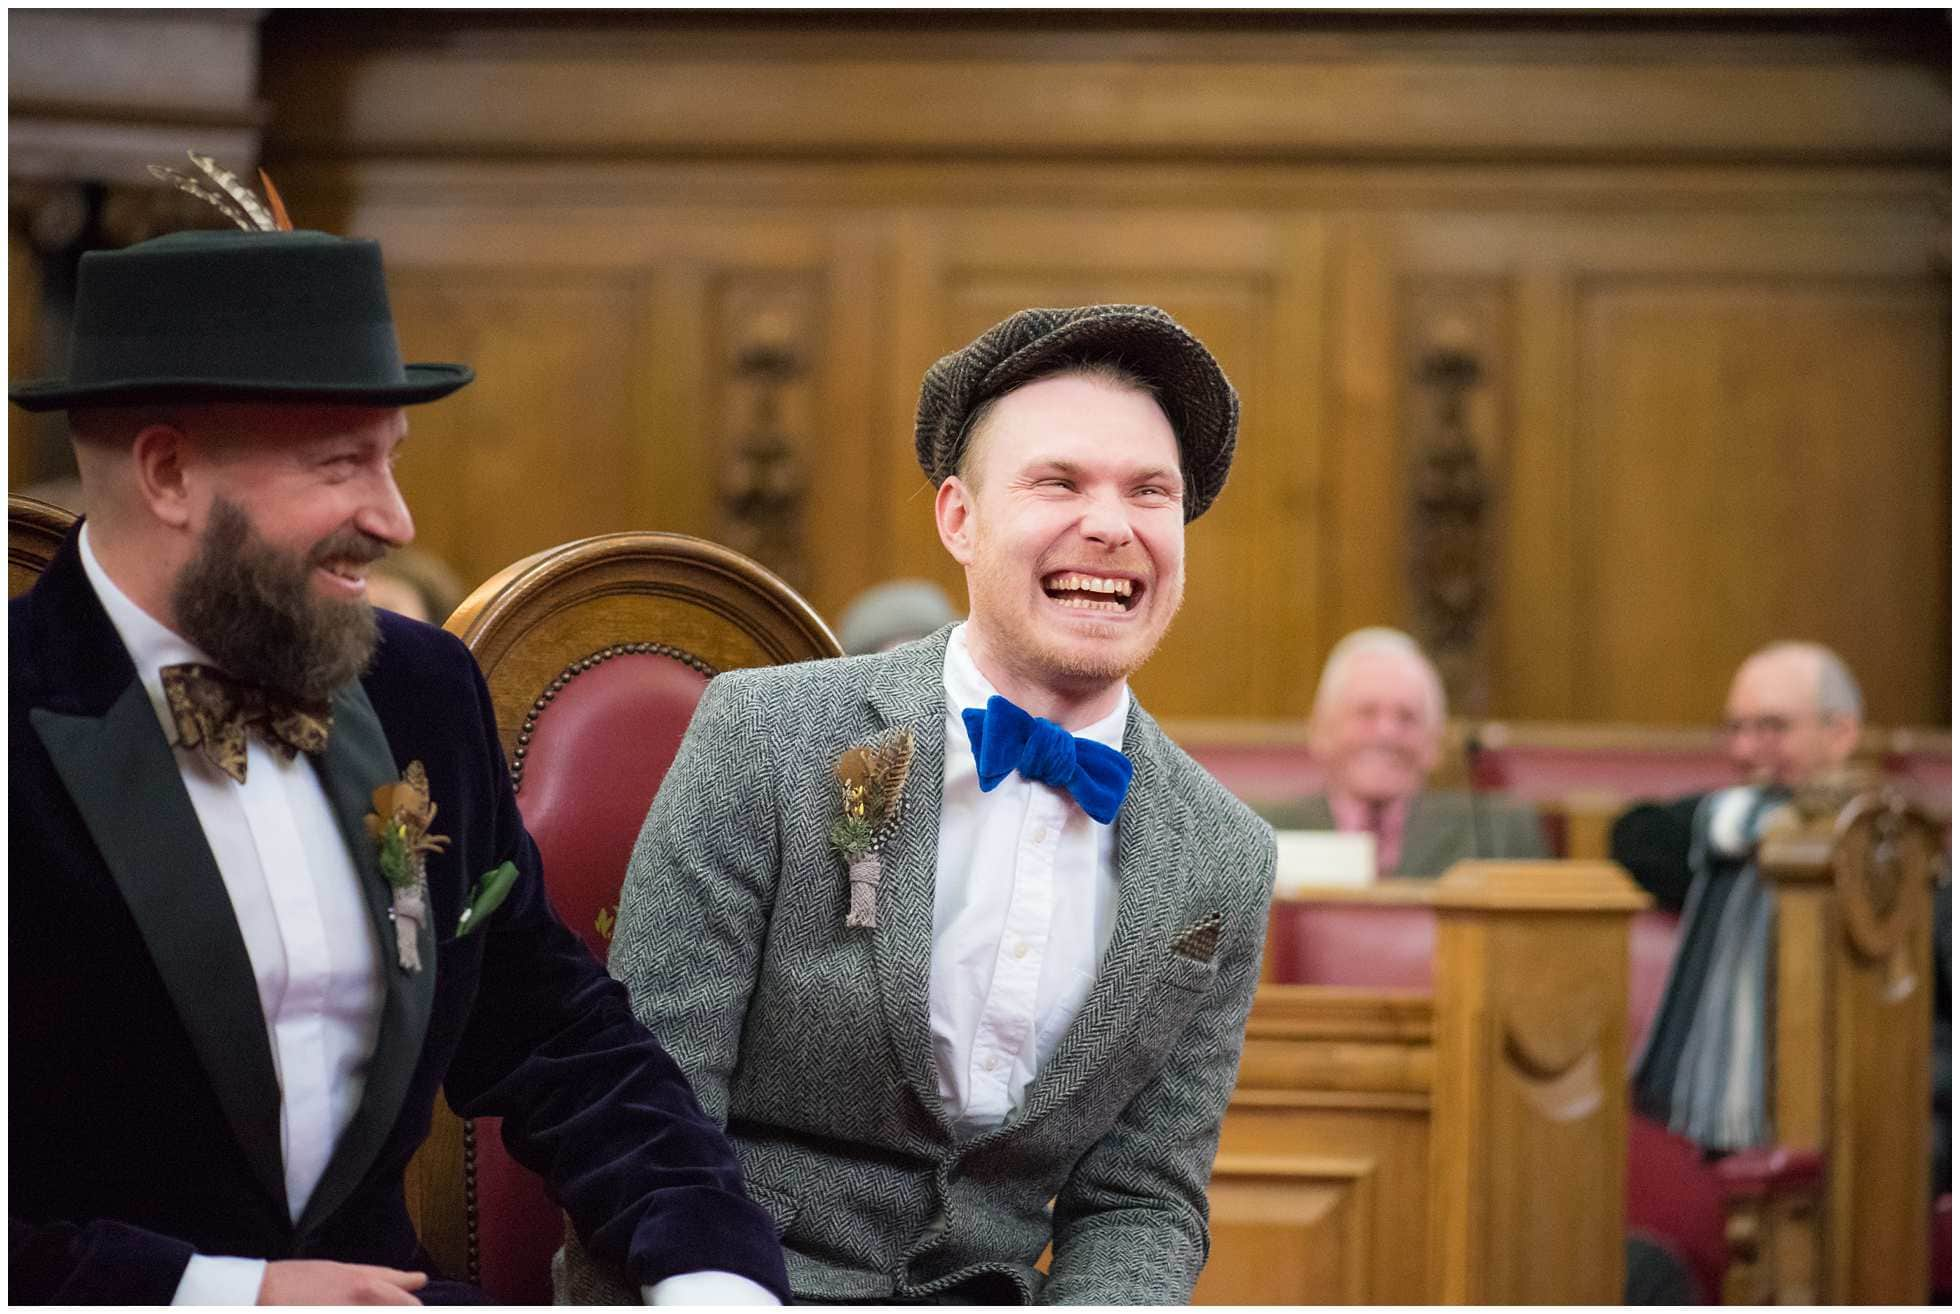 gay wedding photography islington town hall very happy groom